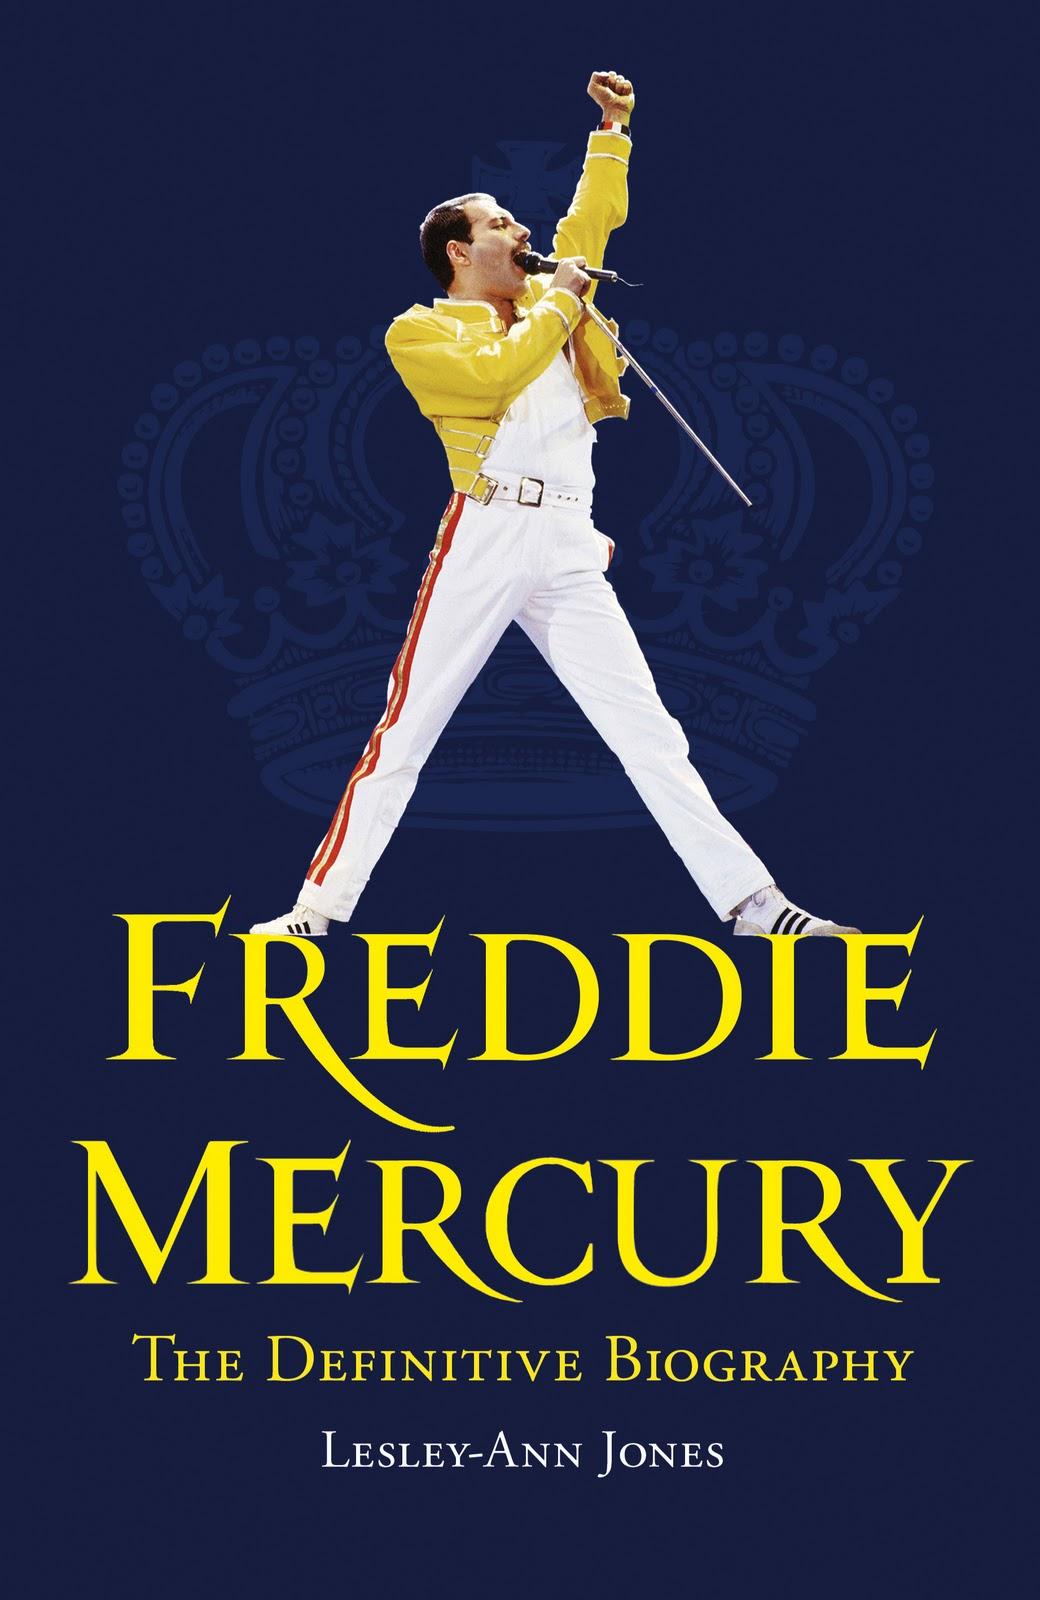 https://i0.wp.com/1.bp.blogspot.com/-vgH1YpmlVo4/T4p2IfXN3eI/AAAAAAAAAfk/f5HIqsJBgrw/s1600/Freddie+Mercury+Cover.jpg